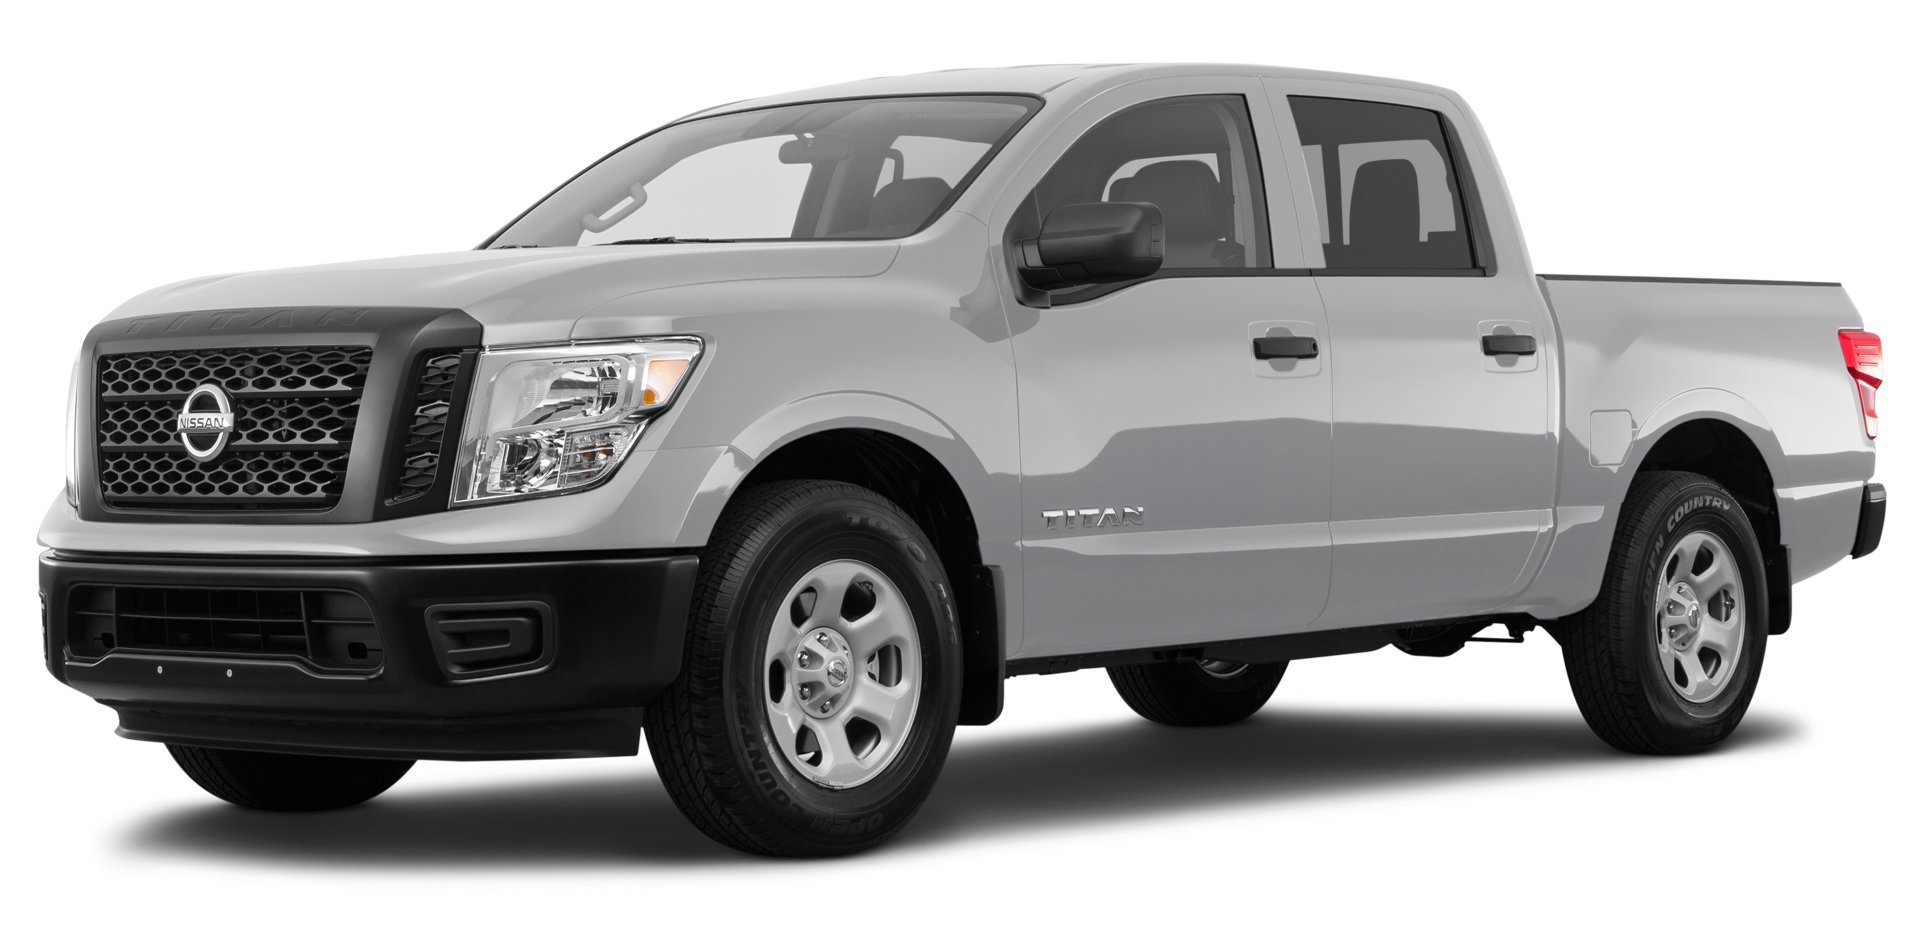 Amazon.com: 2017 Nissan Frontier Desert Runner, Crew Cab 4x2 Automatic